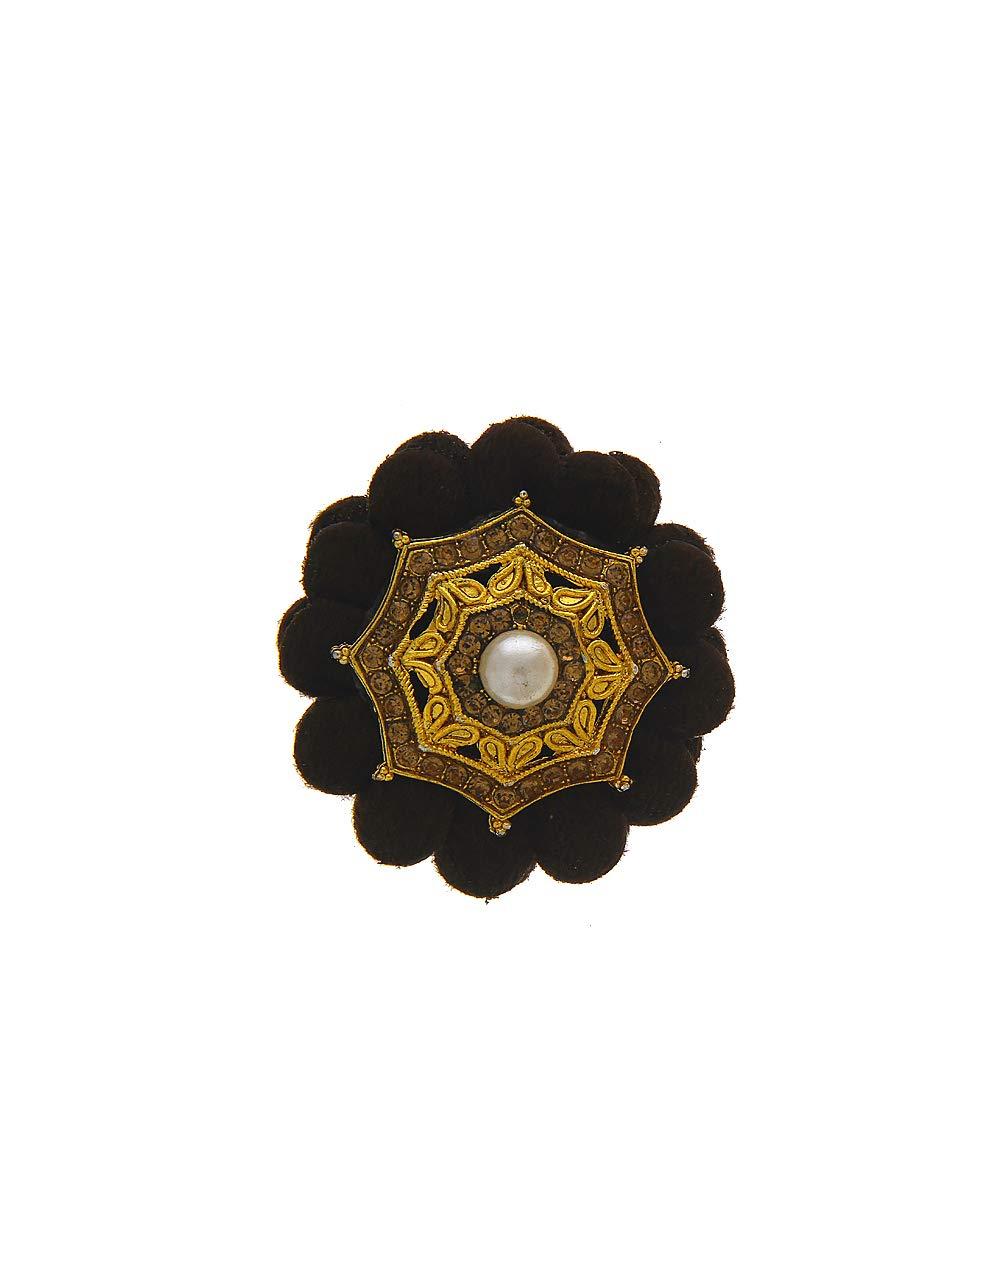 Anuradha Art Black Colour Styled with Studded Stone Wonderful Sari/Saree Pin for Women/Girls